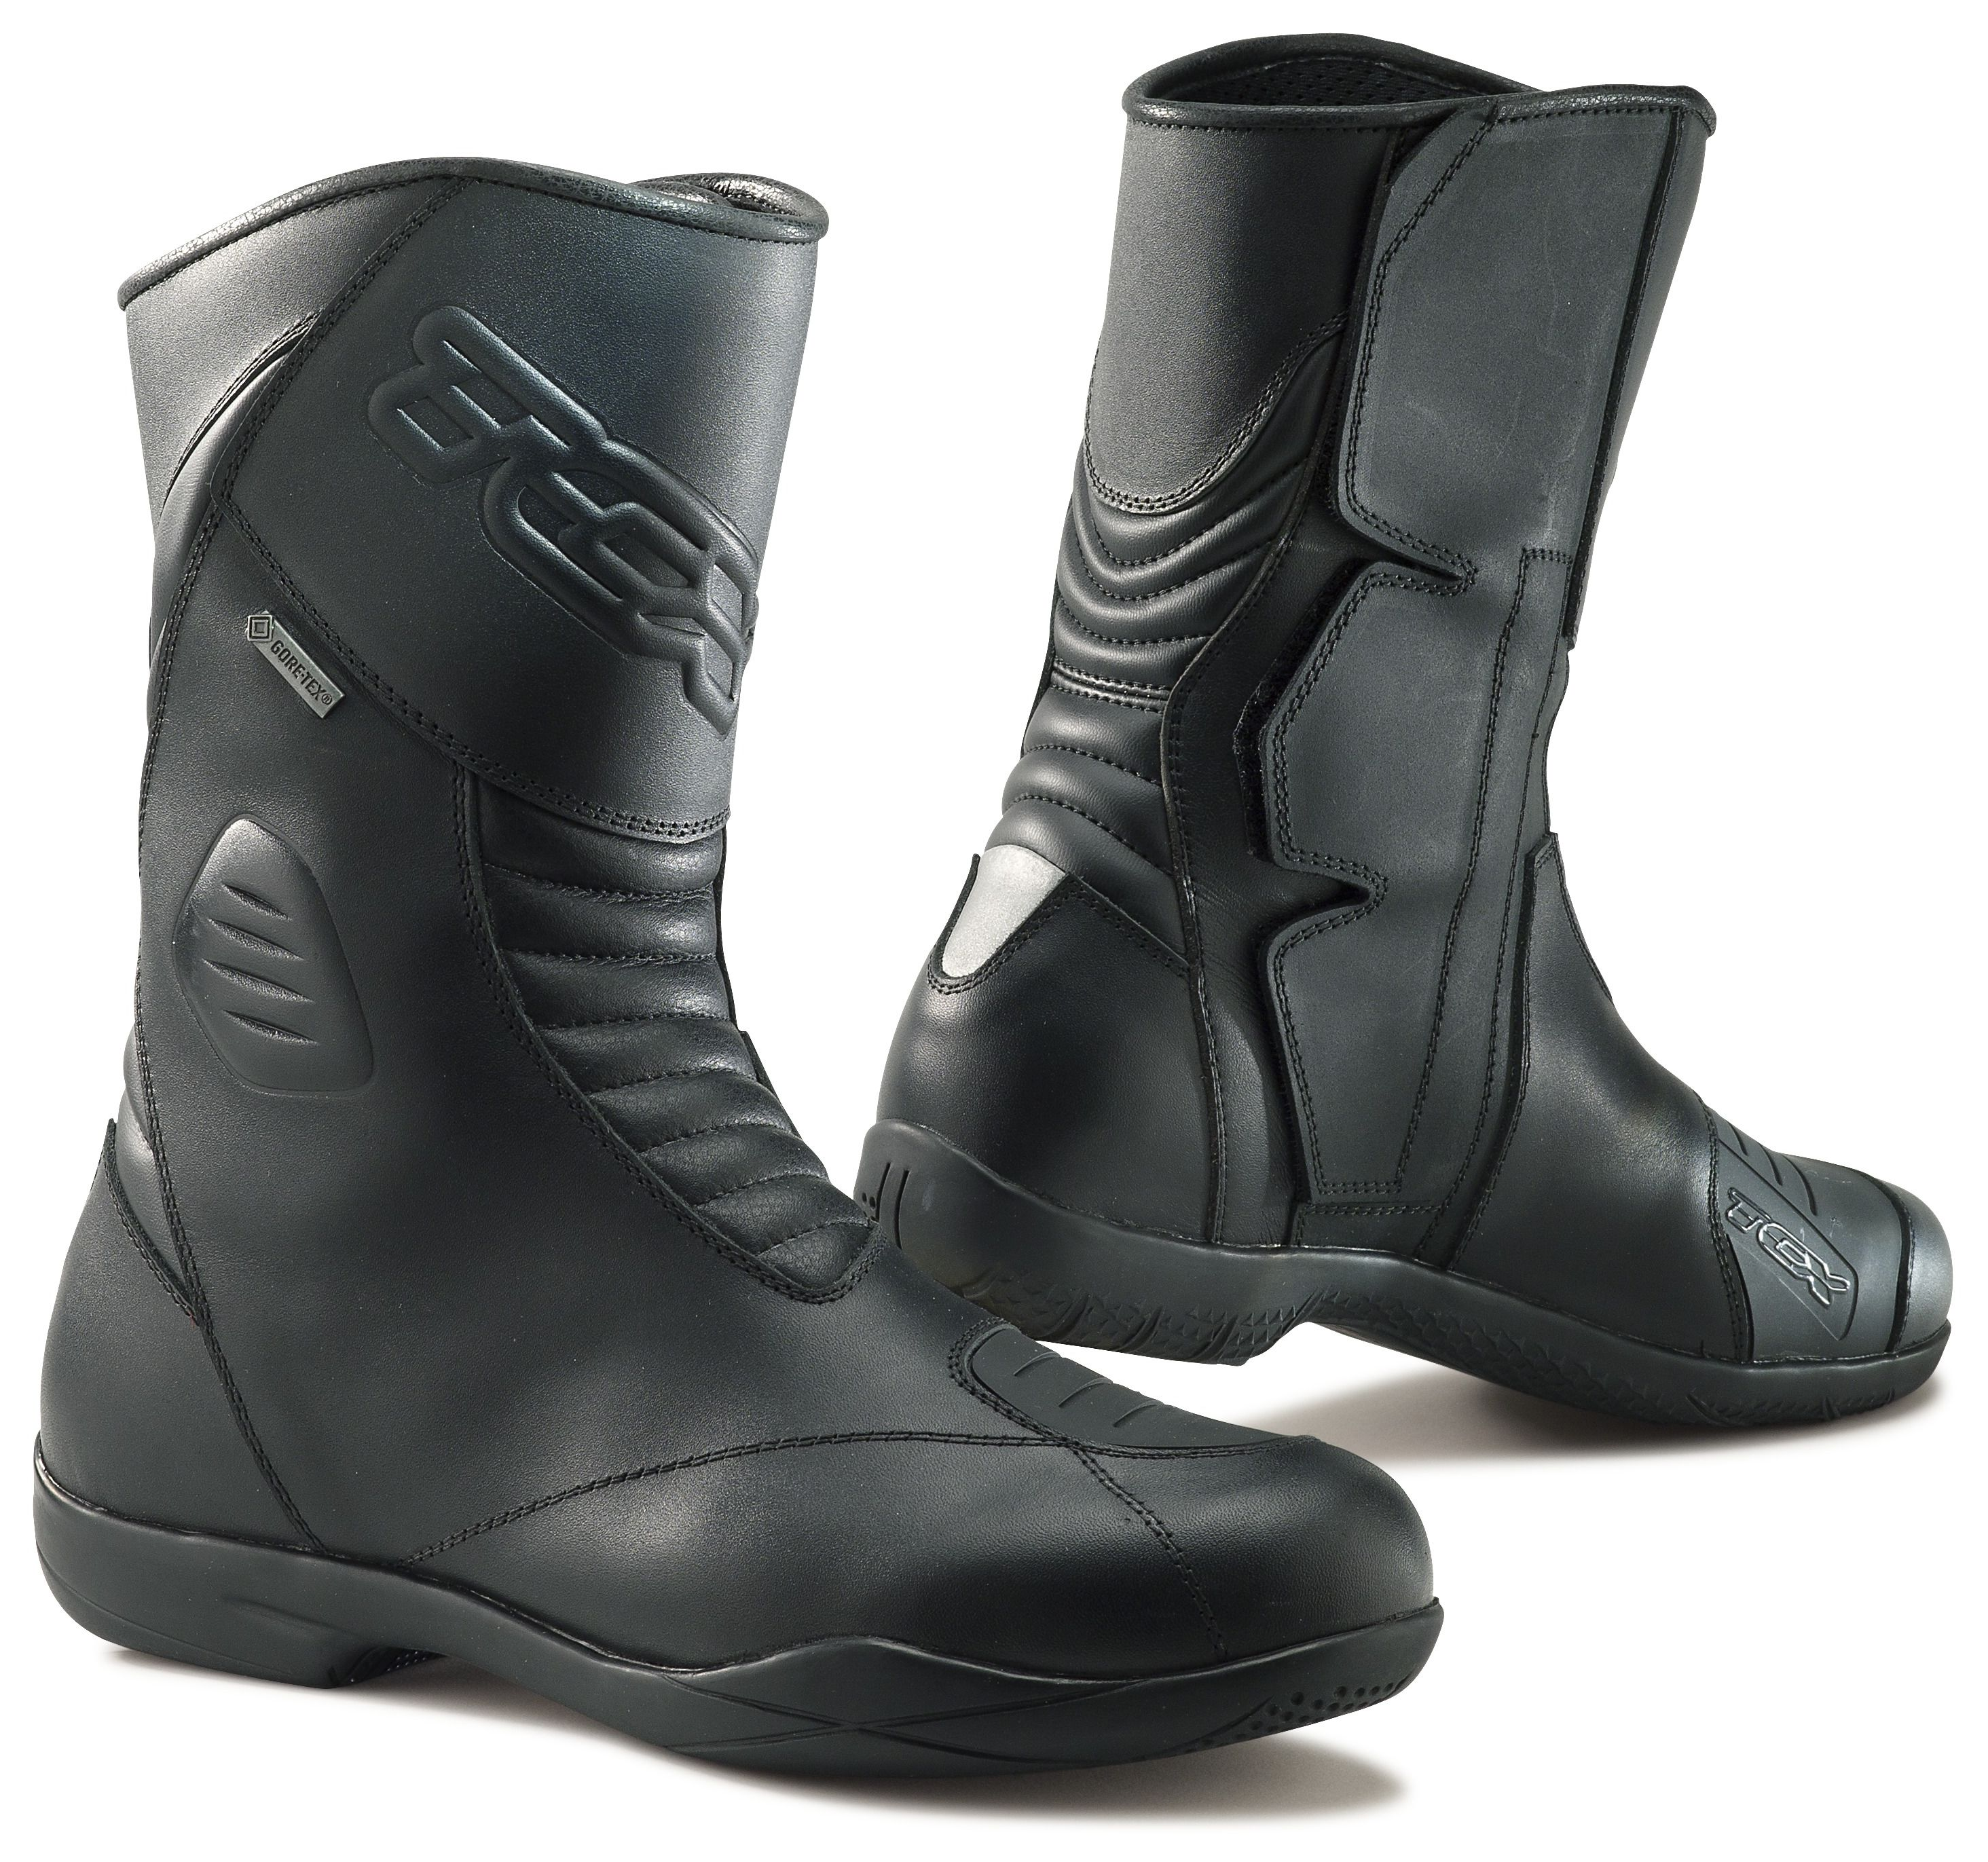 a0c761fd72 TCX X-Five EVO Gore-Tex Boots